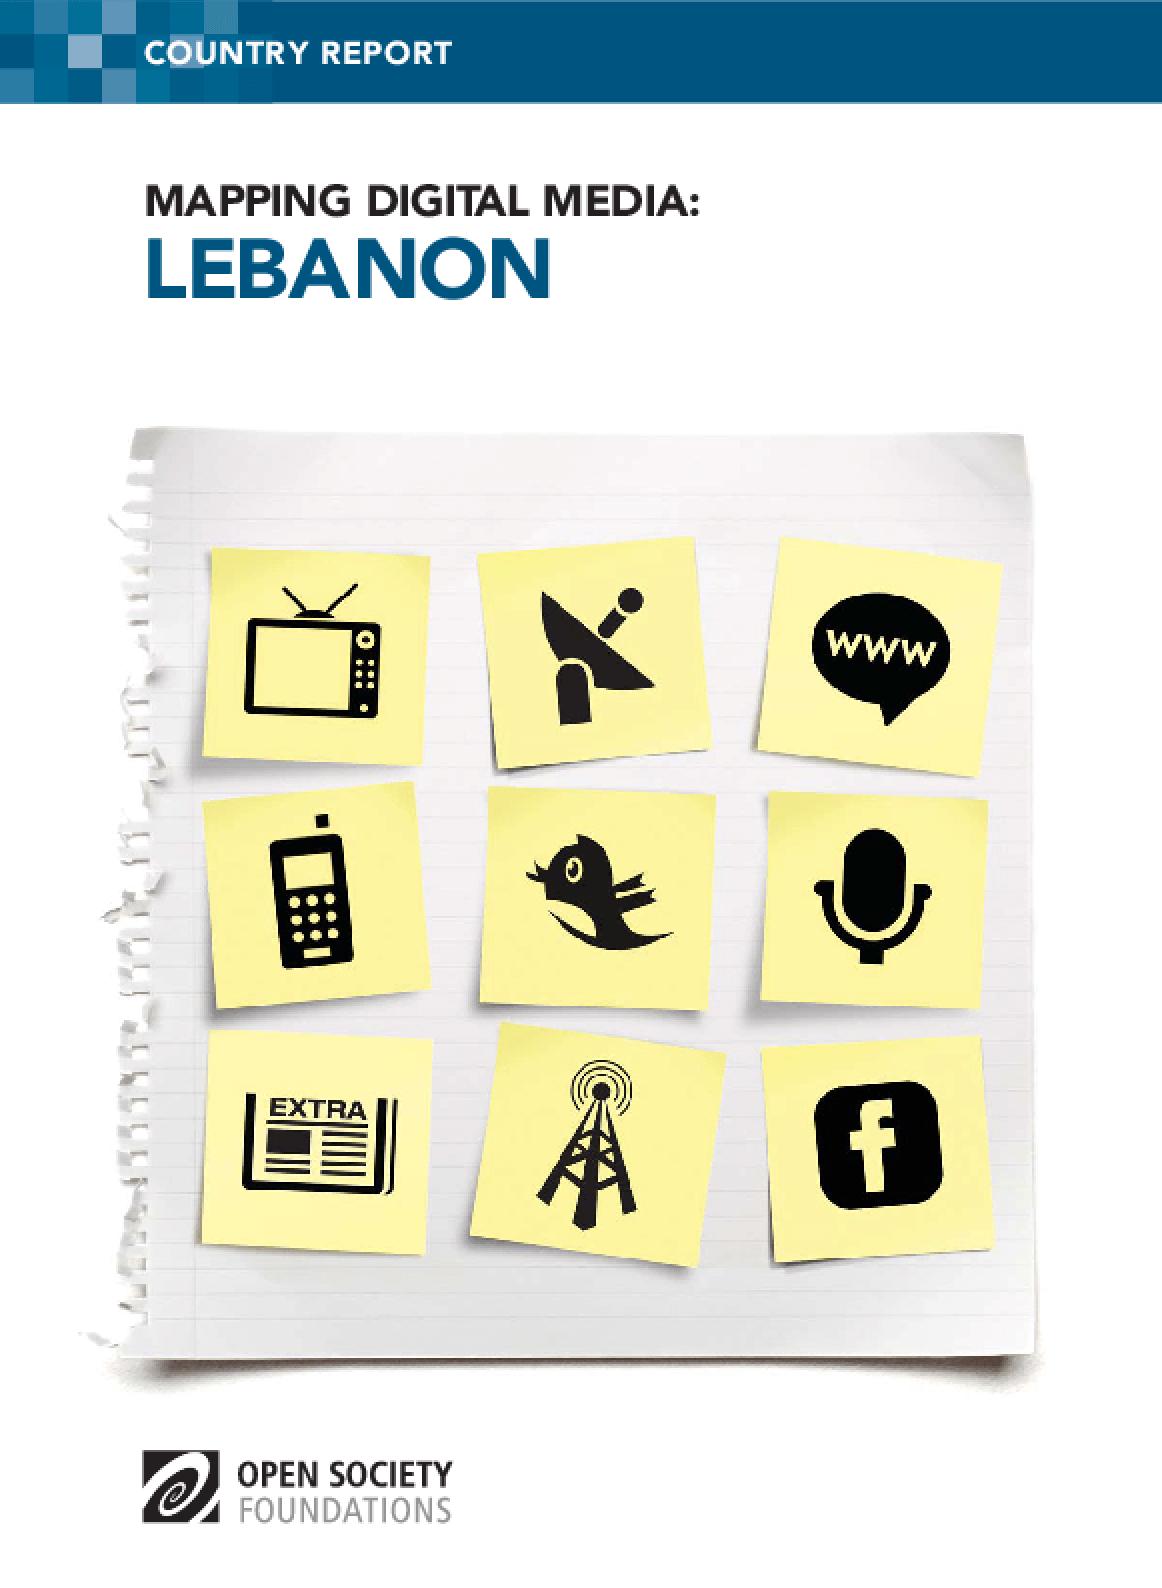 Mapping Digital Media: Lebanon